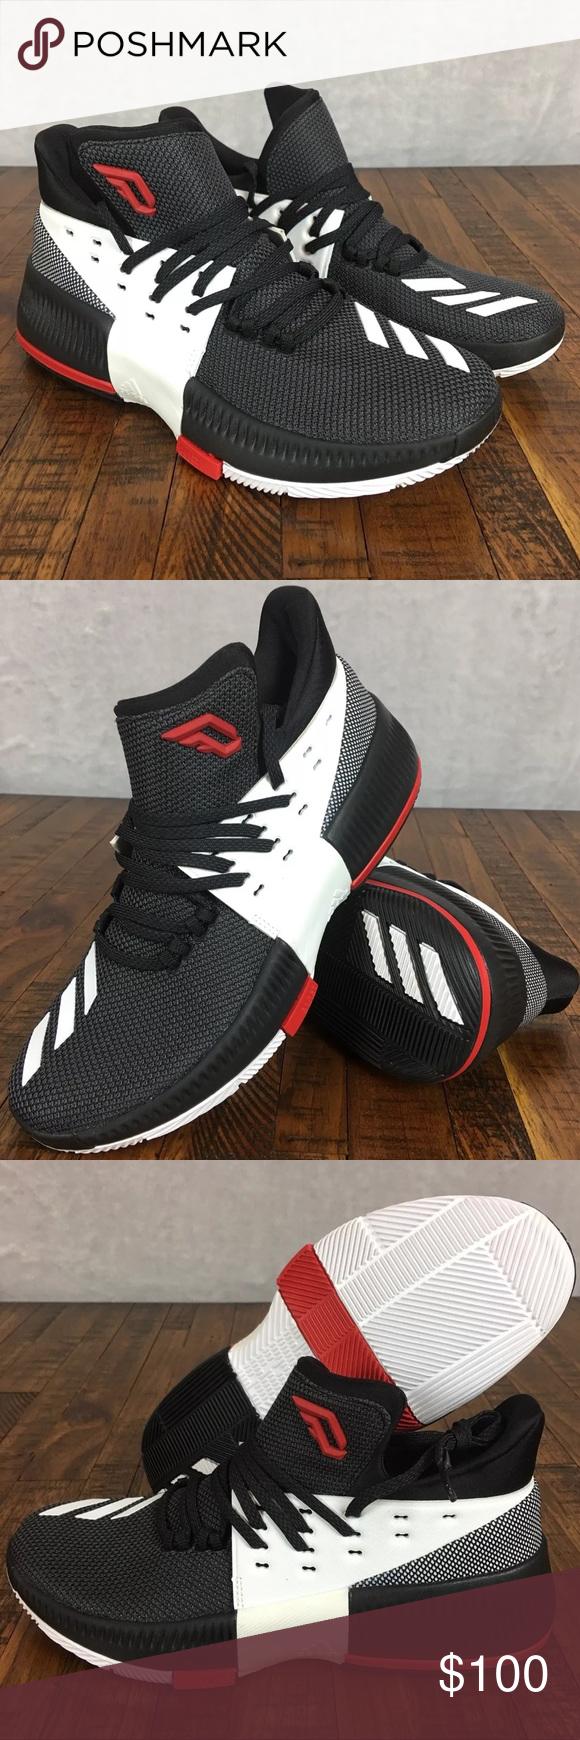 NEW Adidas Damian Lillard 3 Shoes Youth Or Womens ADIDAS DAMIAN LILLARD 3  JUNIOR BASKETBALL SHOES 3b415124df